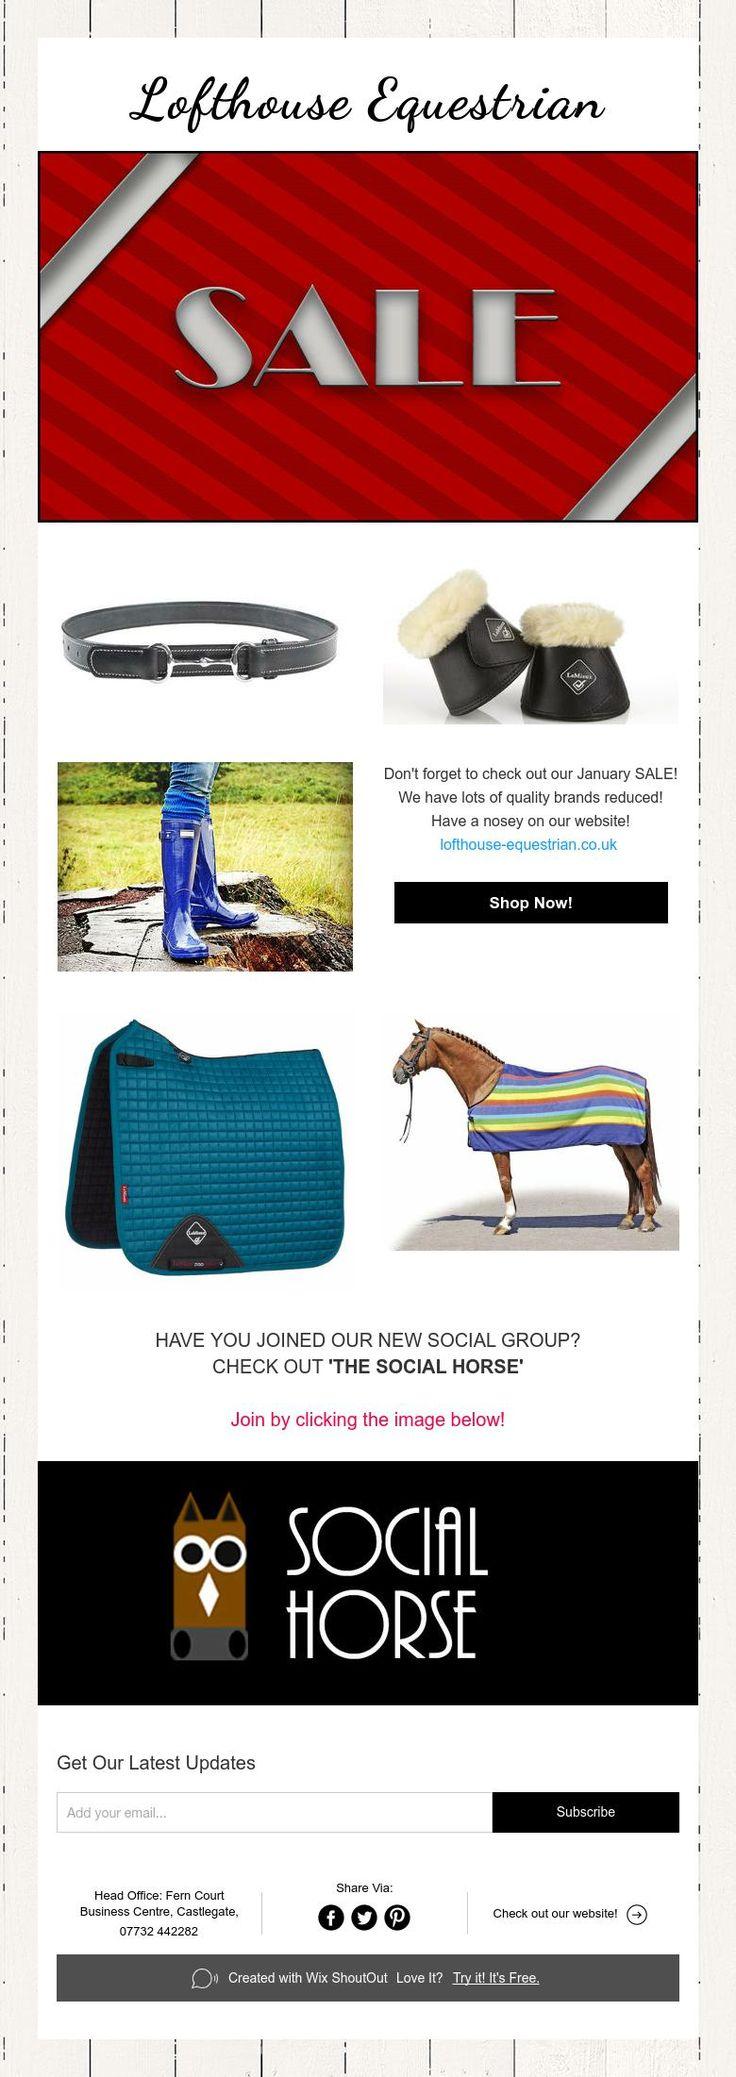 Lofthouse Equestrian Newsletter! #januarysale #sale